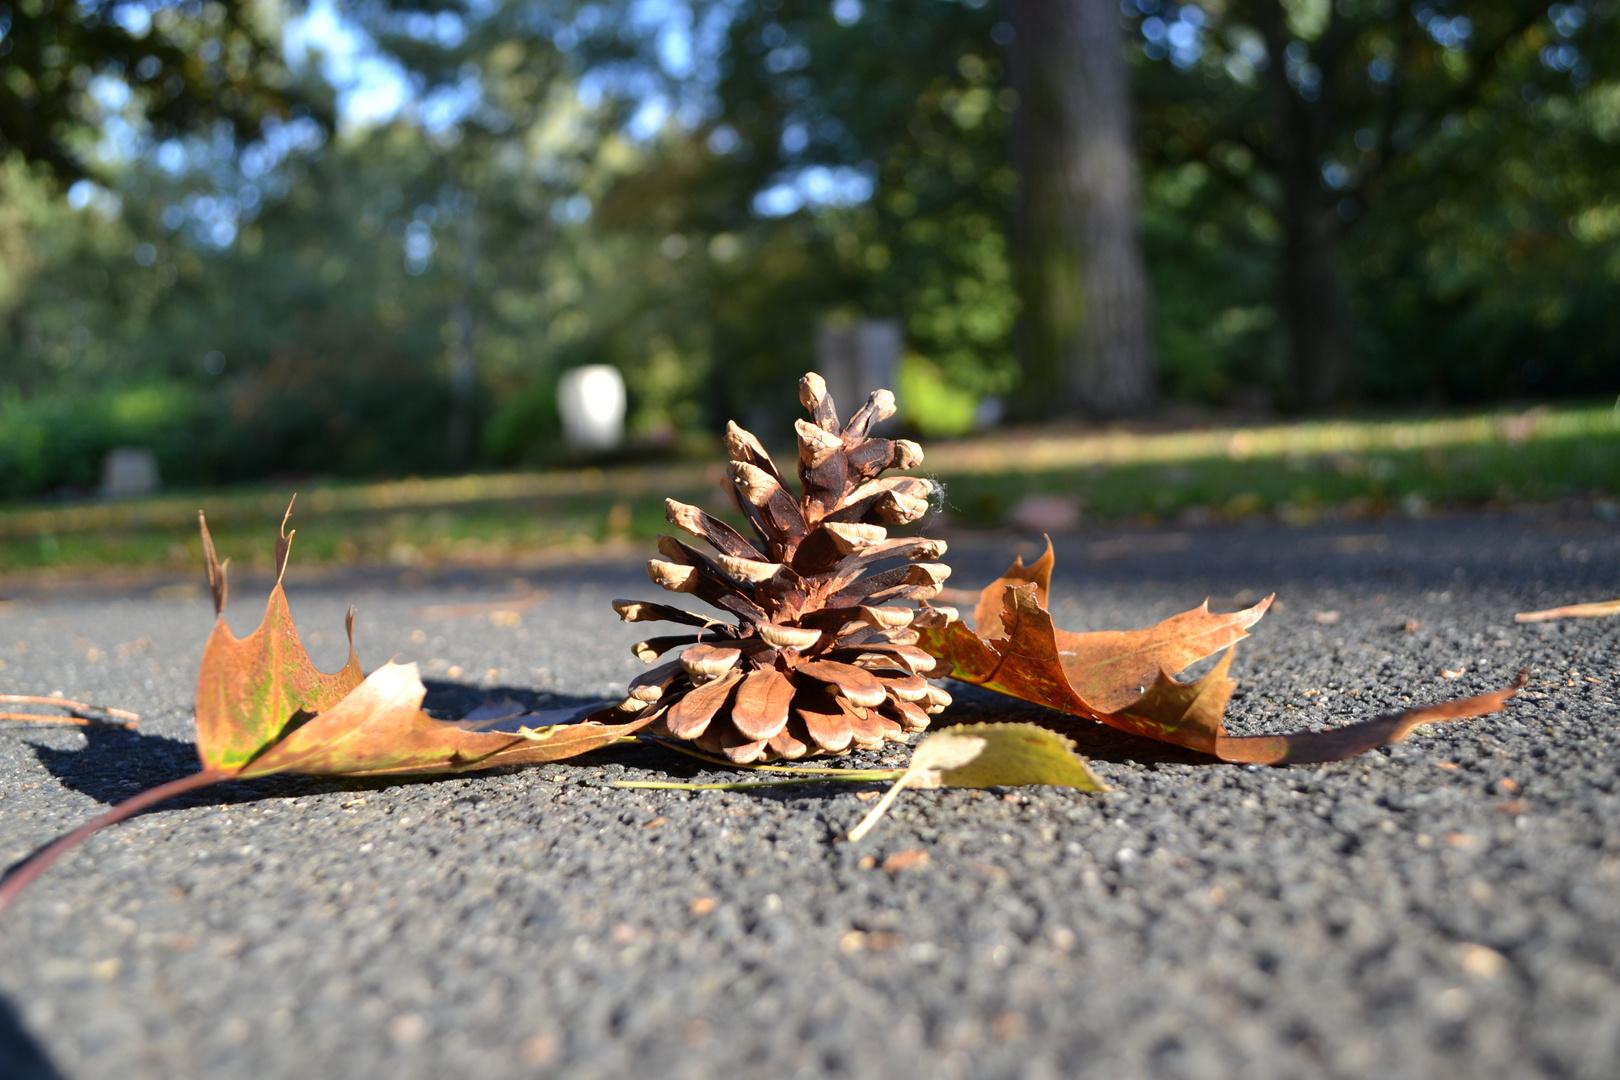 Ja, der Herbst kommt...